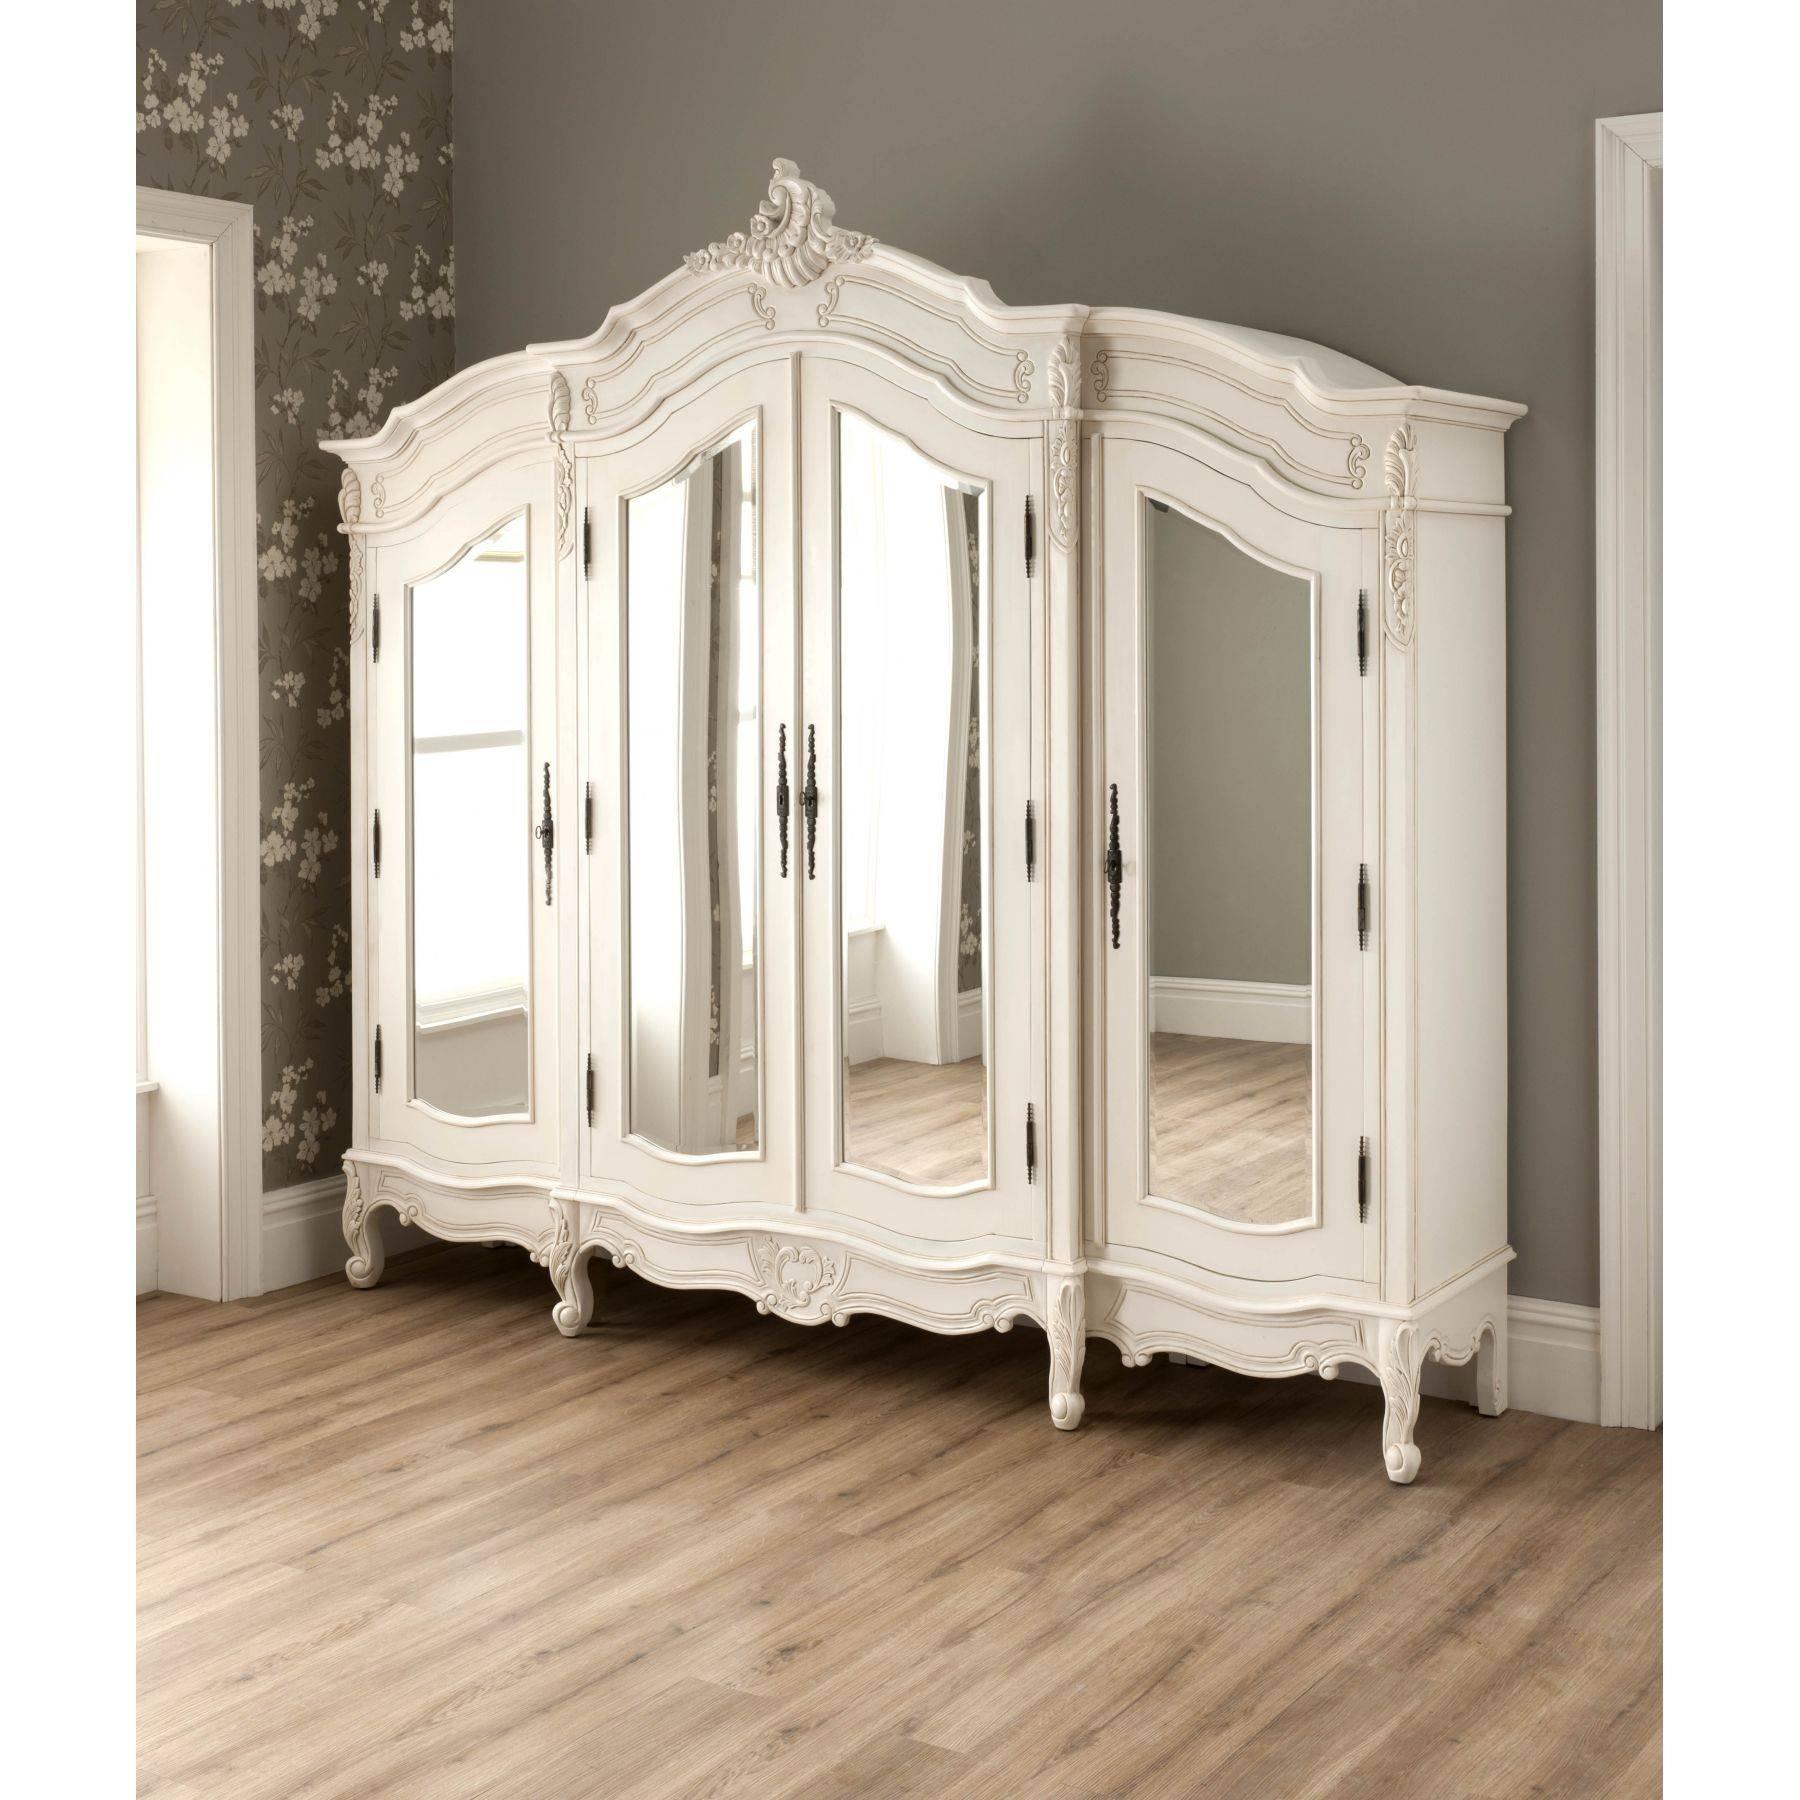 Shabby Chic Furniture Uk | French Furniture & Mirrored |Homesdirect365 regarding Cheap Shabby Chic Wardrobes (Image 12 of 15)